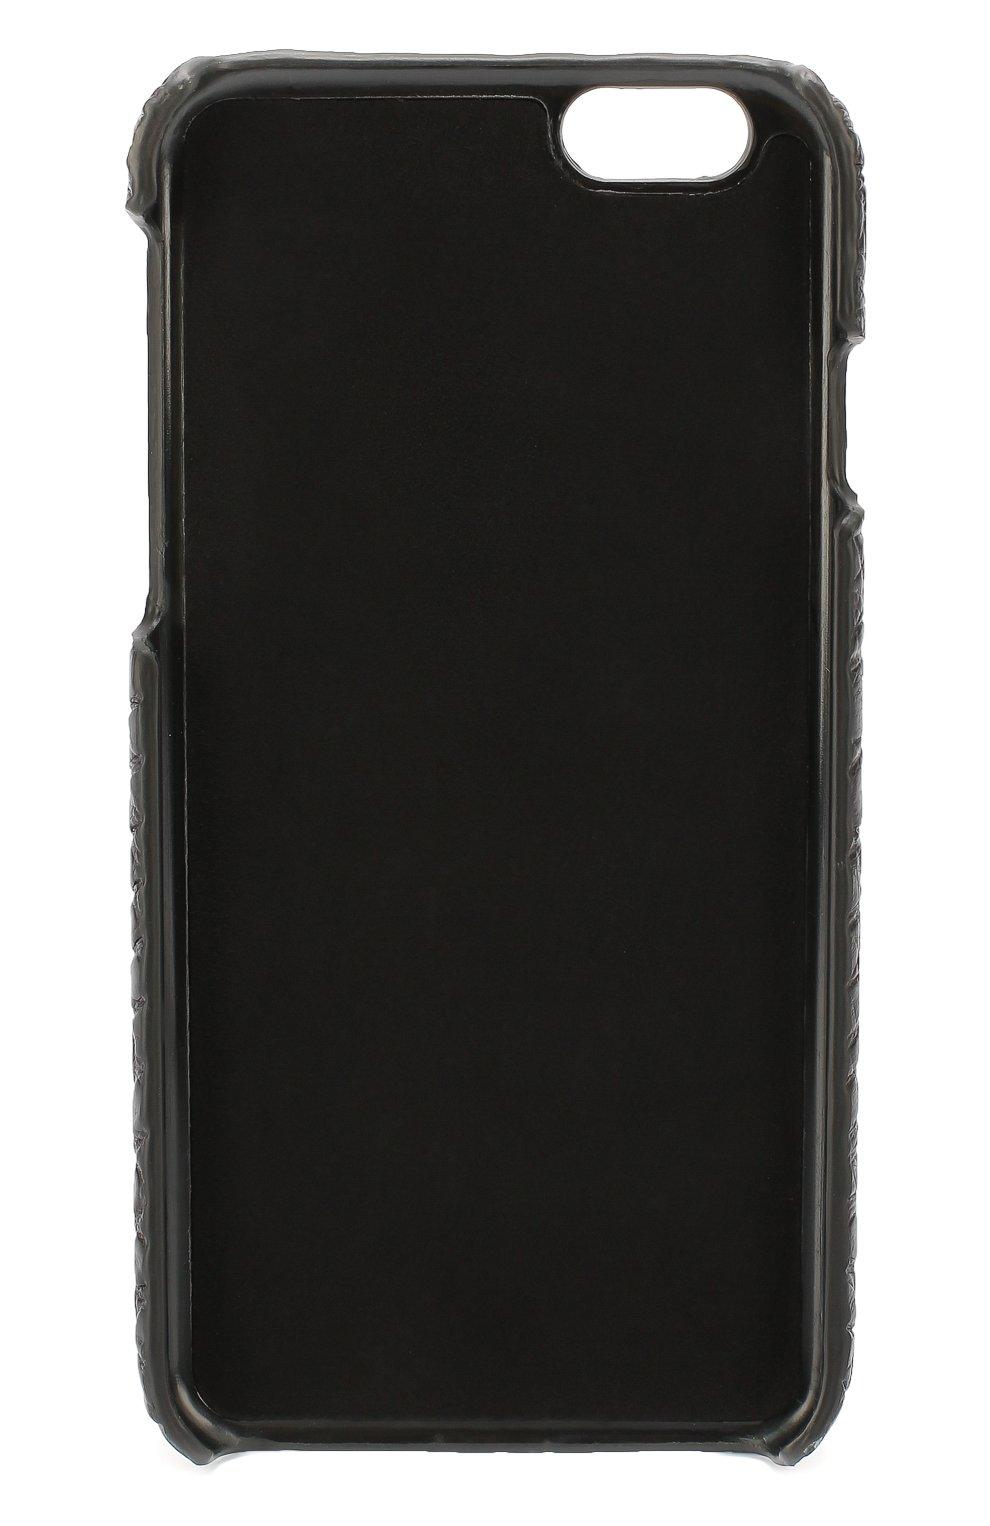 Чехол для iPhone 6/6S из кожи крокодила Dolce & Gabbana  | Фото №2